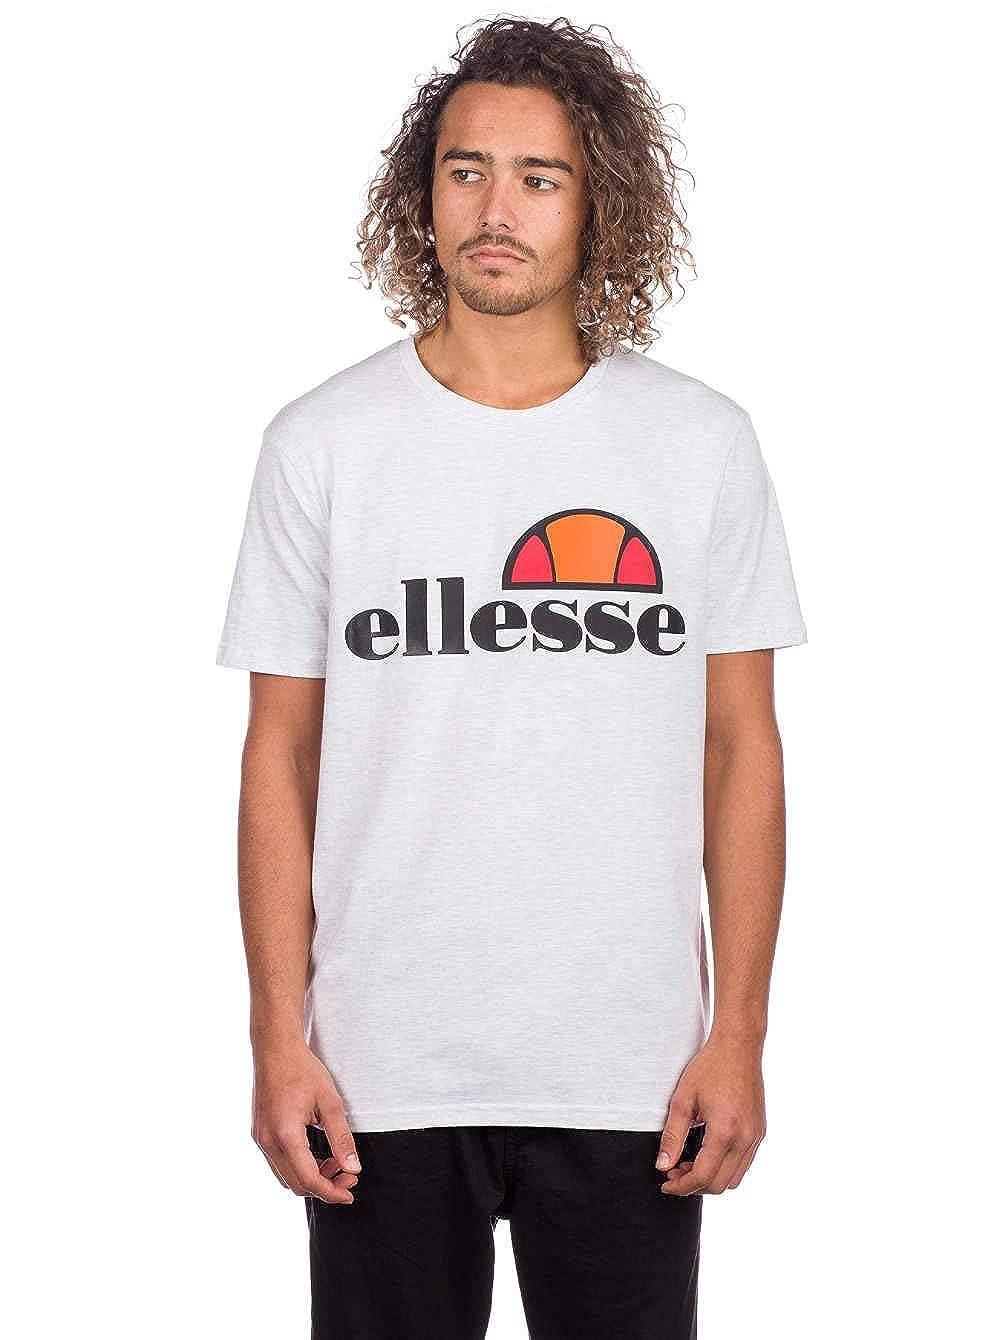 a4284b57 ellesse Men's Prado T-Shirt, White, Large